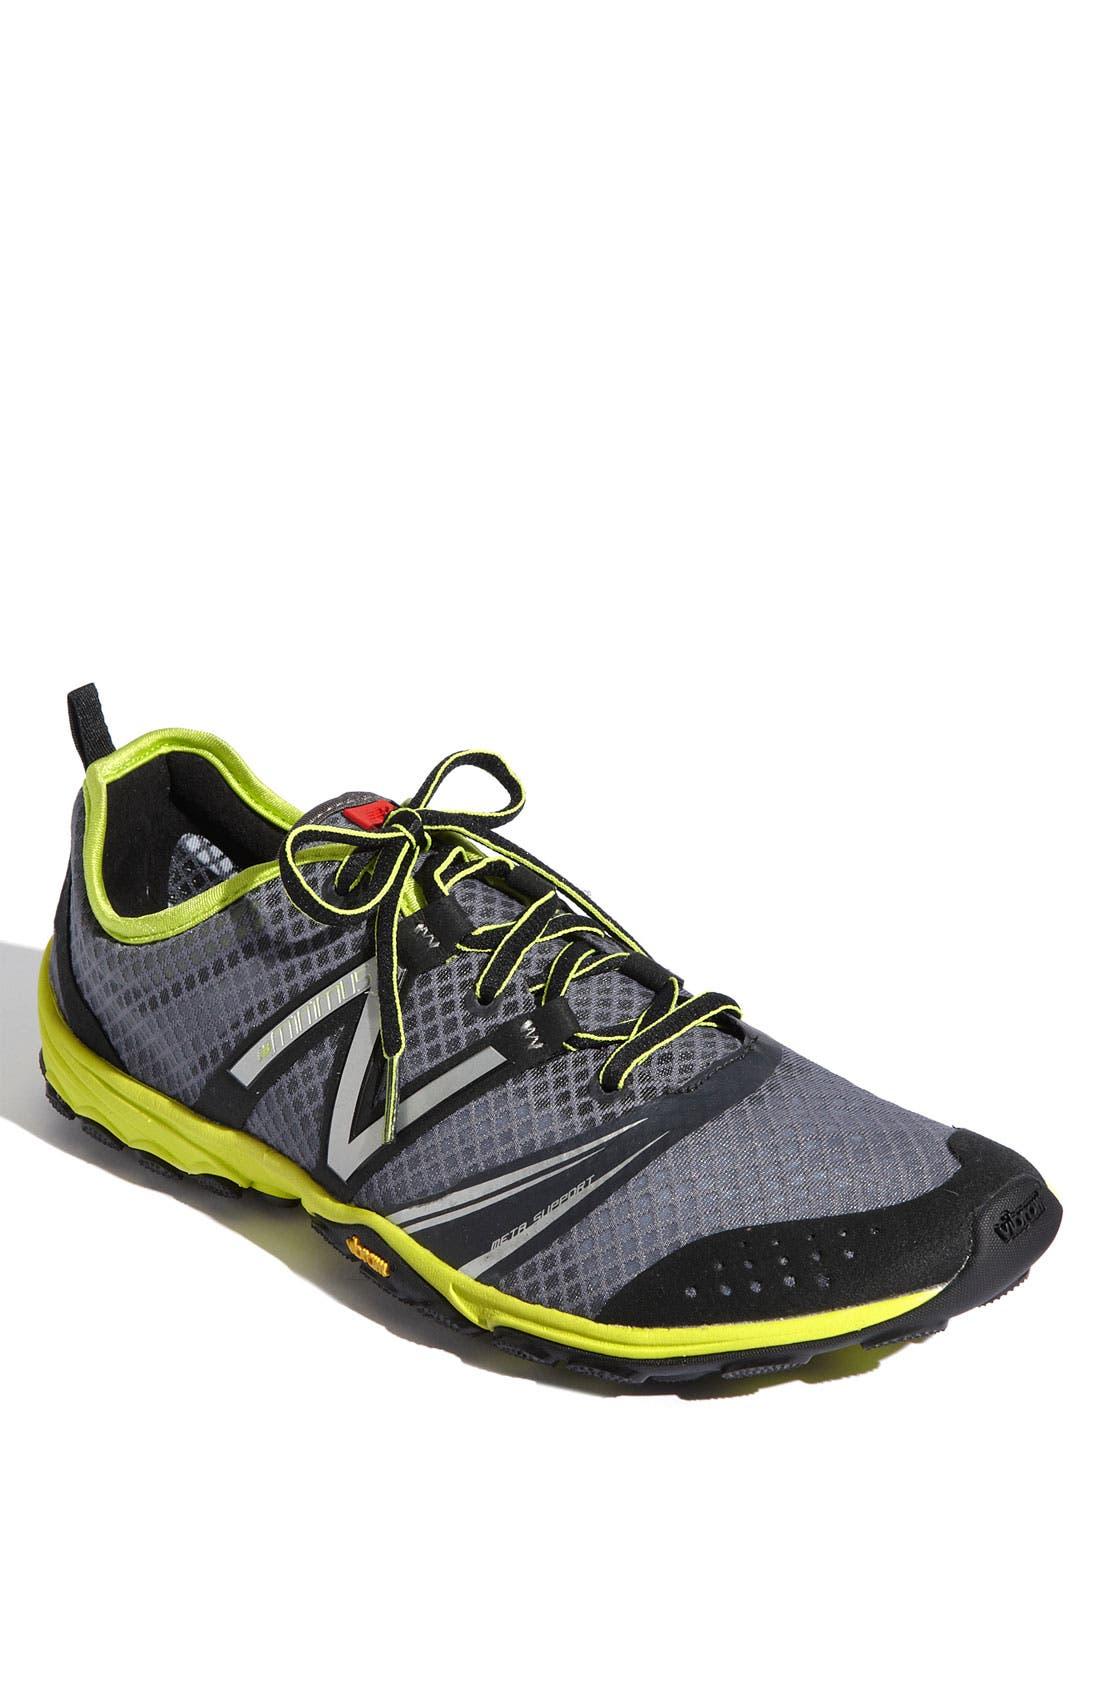 Alternate Image 1 Selected - New Balance 'Minimus' Trail Running Shoe (Men)